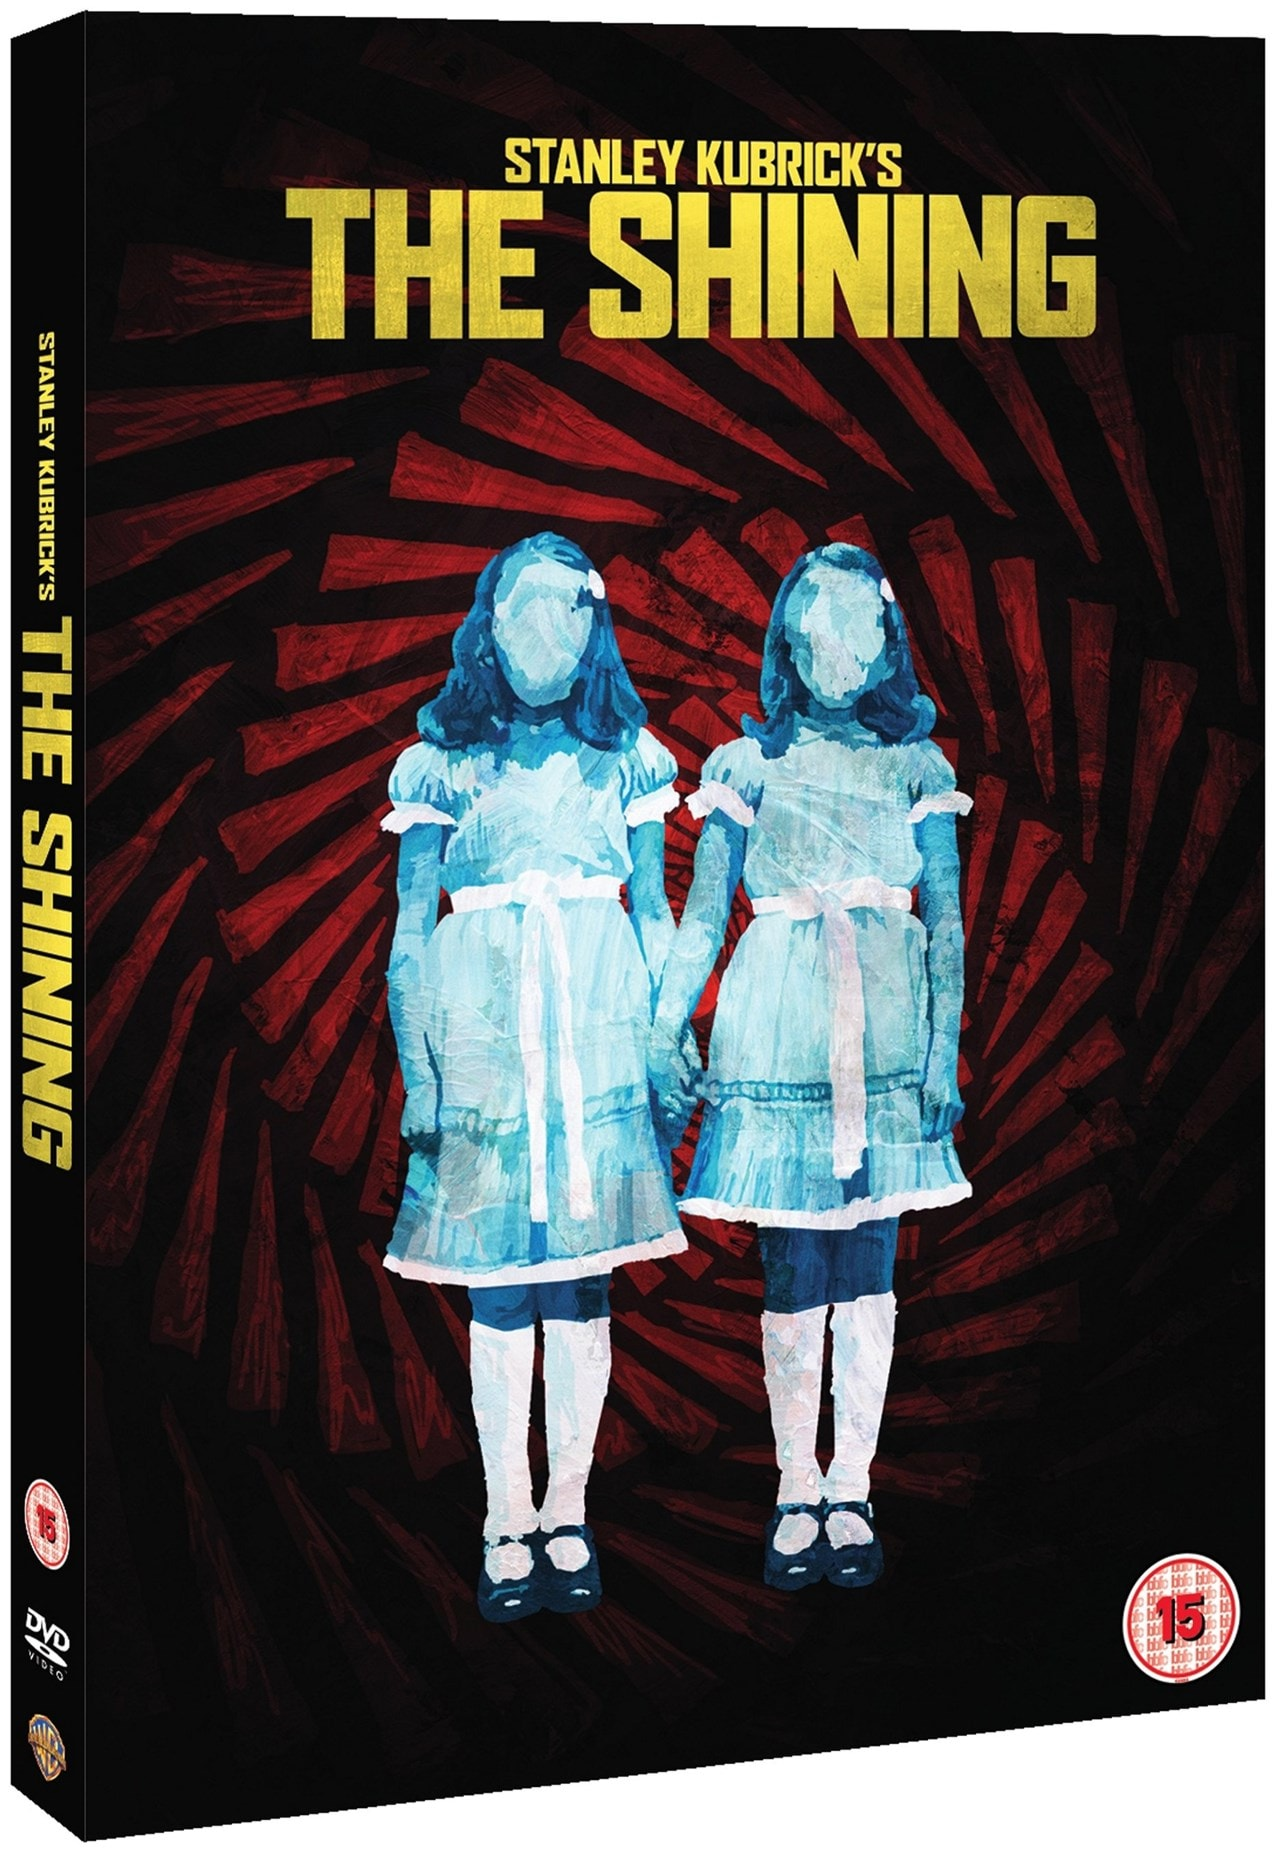 The Shining - 2